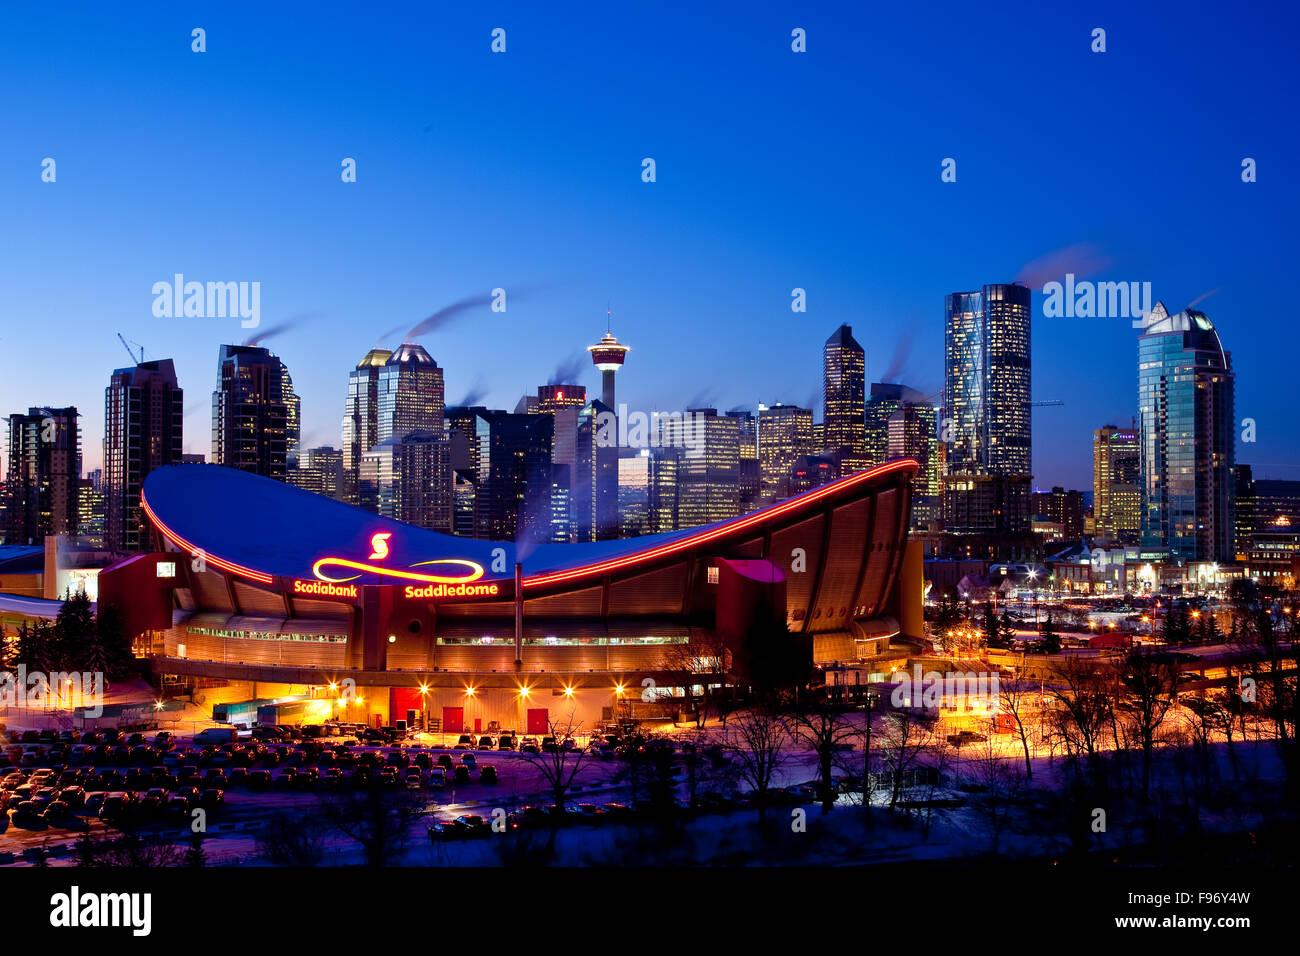 Skyline von Calgary in der Nacht, Calgary, Alberta, Kanada. Stockbild